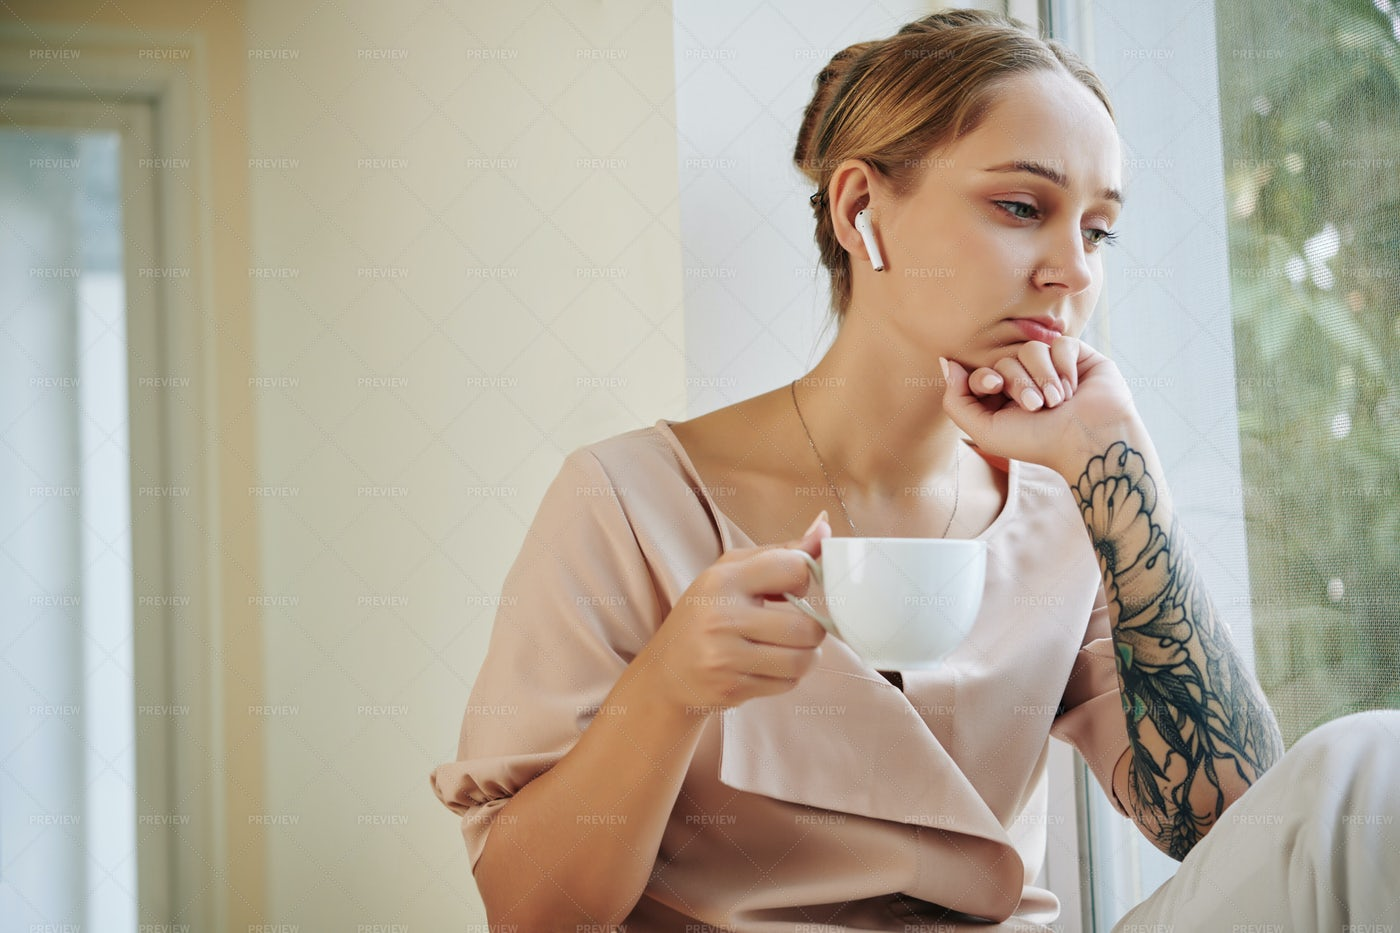 Woman Listening To Serious Audiobook: Stock Photos